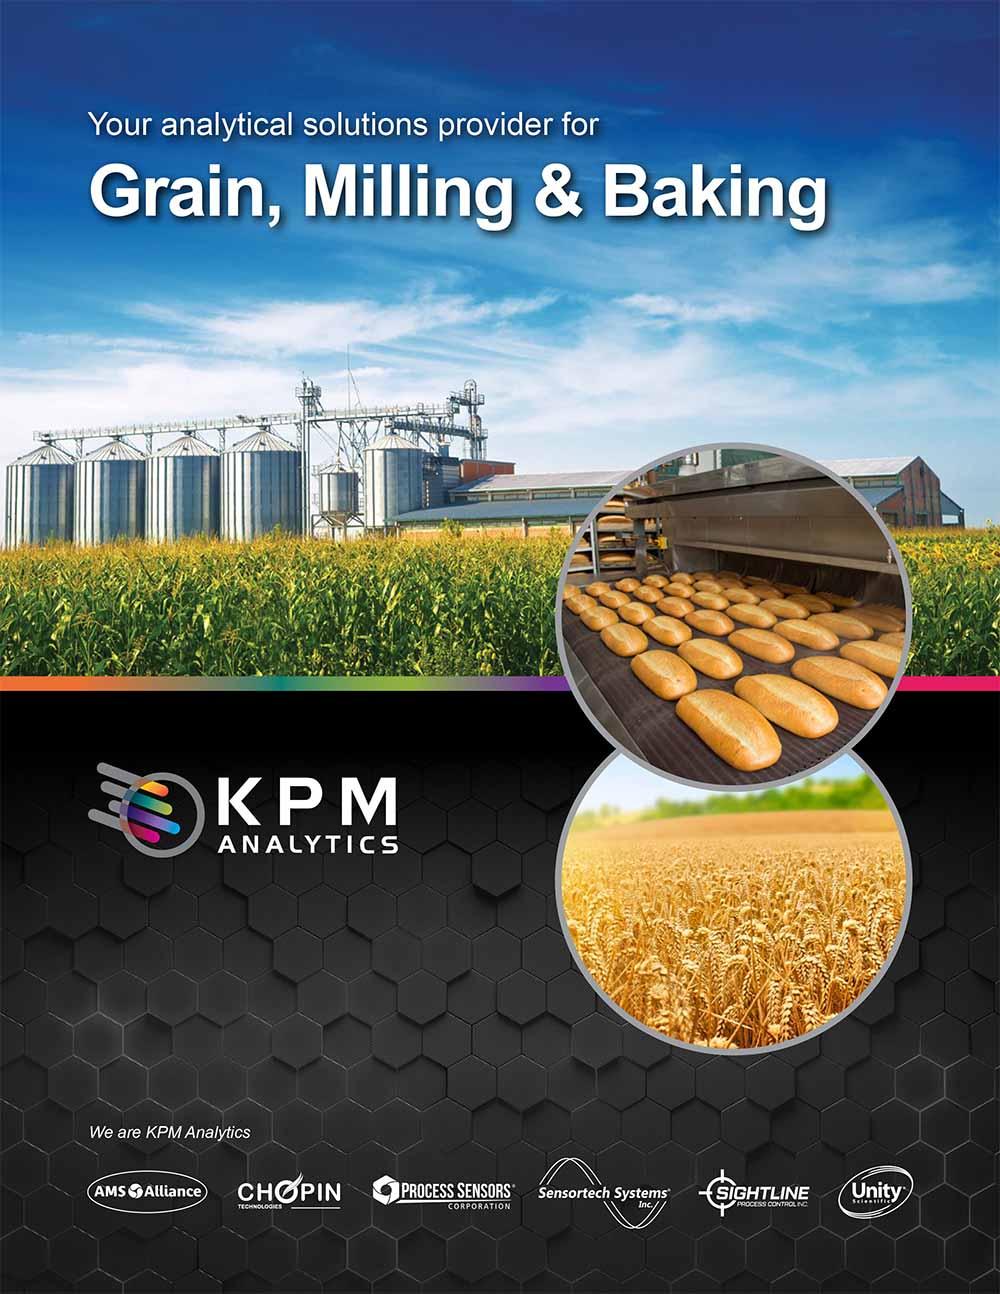 Grain Milling & Baking